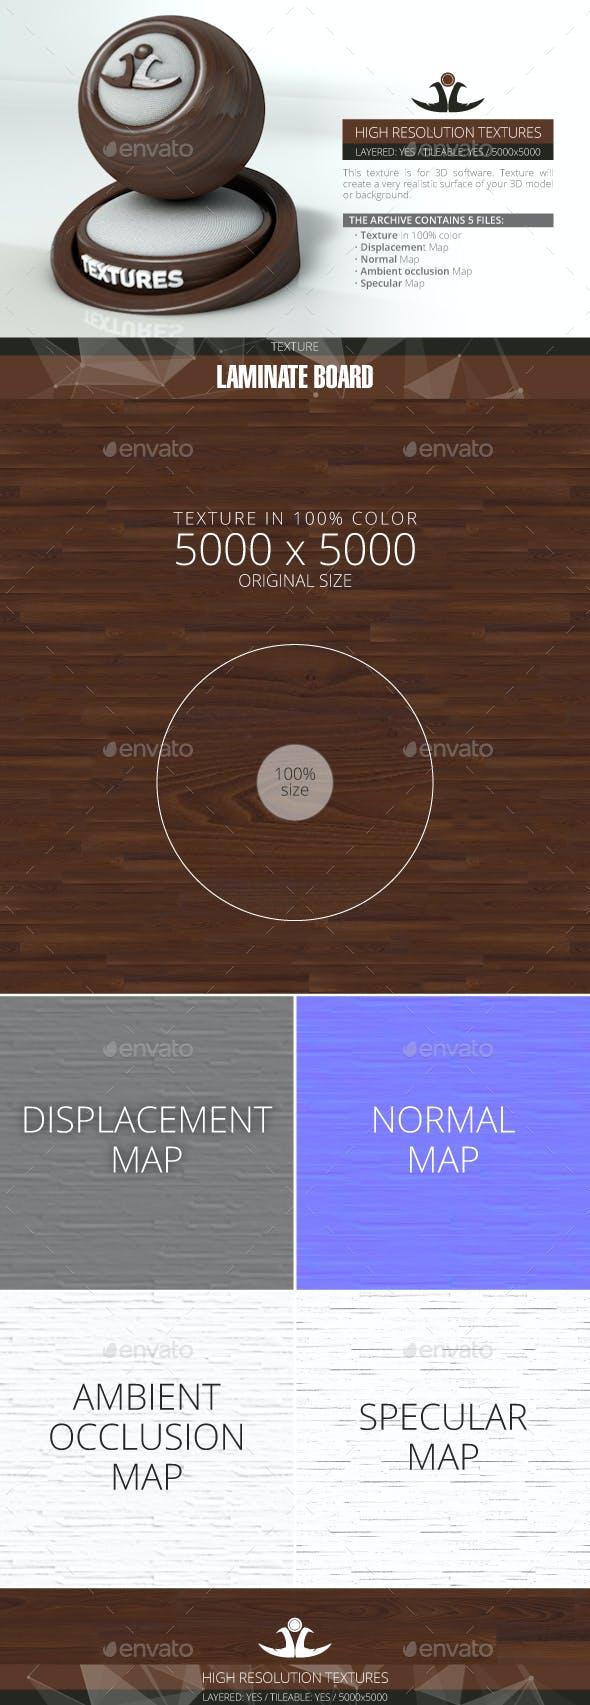 Laminate Board 72 - 3DOcean Item for Sale